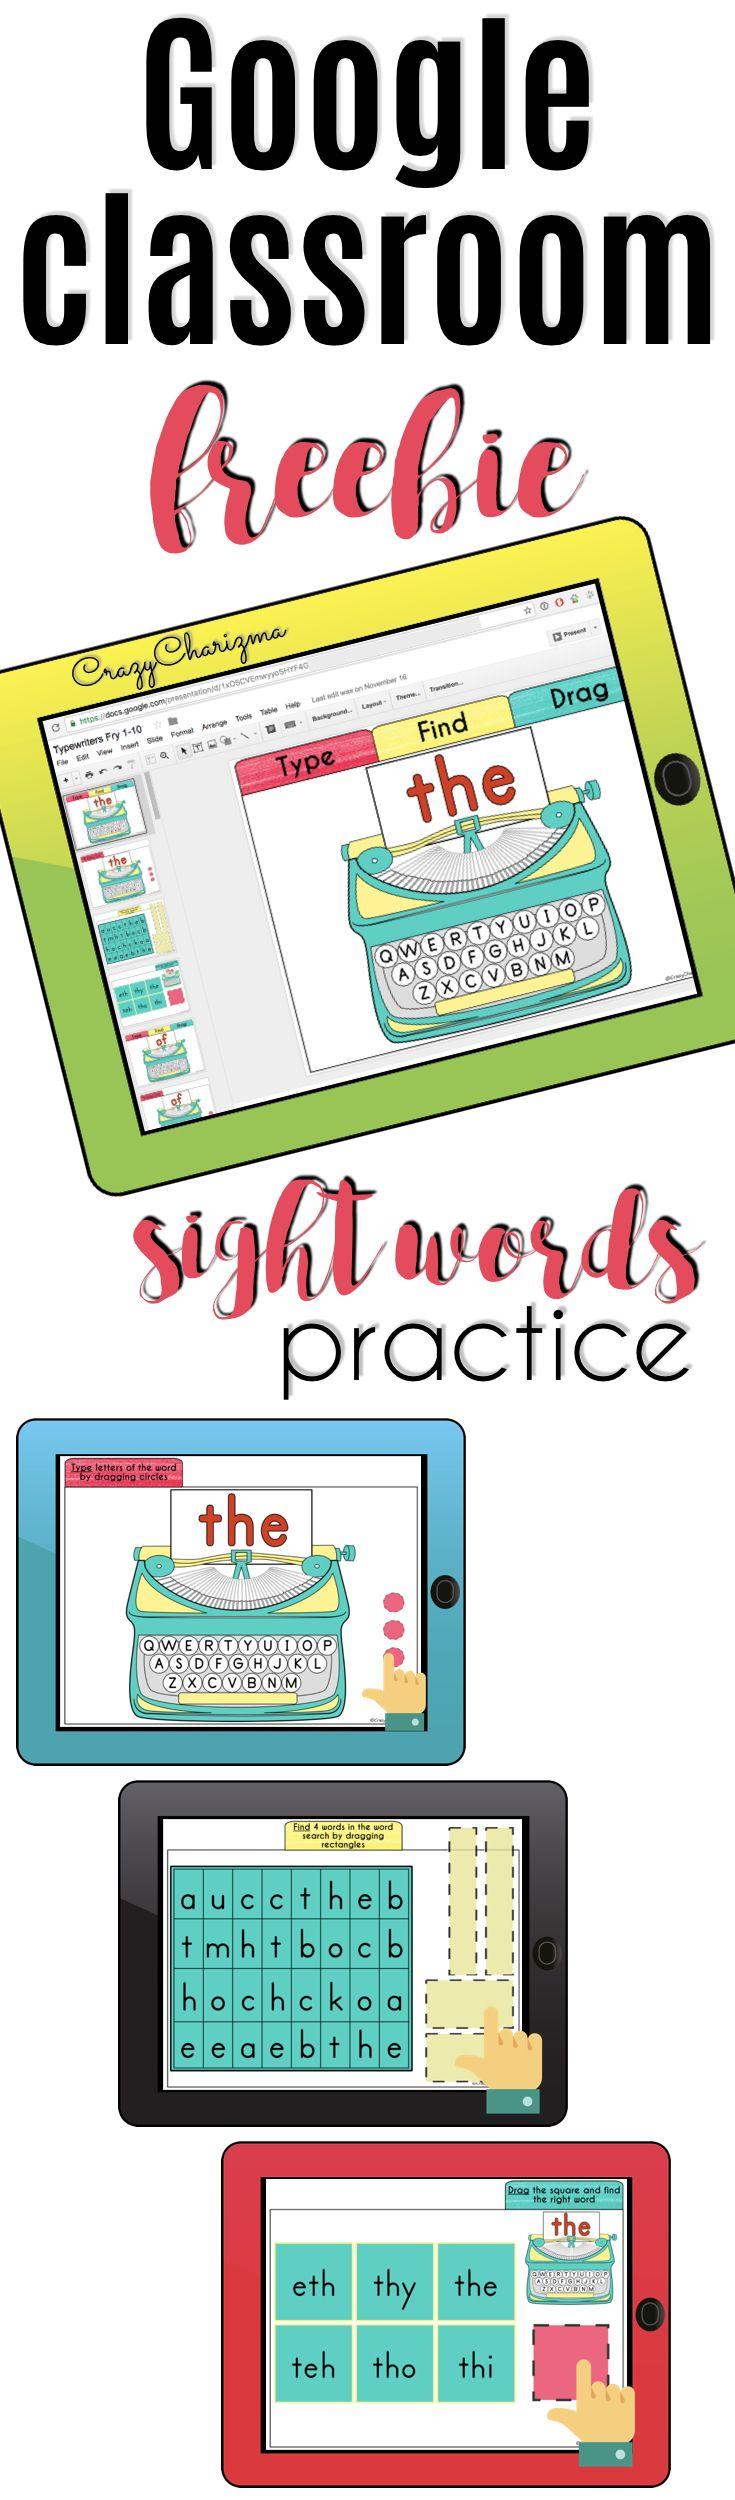 Sight Word Activities for Google Classroom™ (paperless practice) | Kind